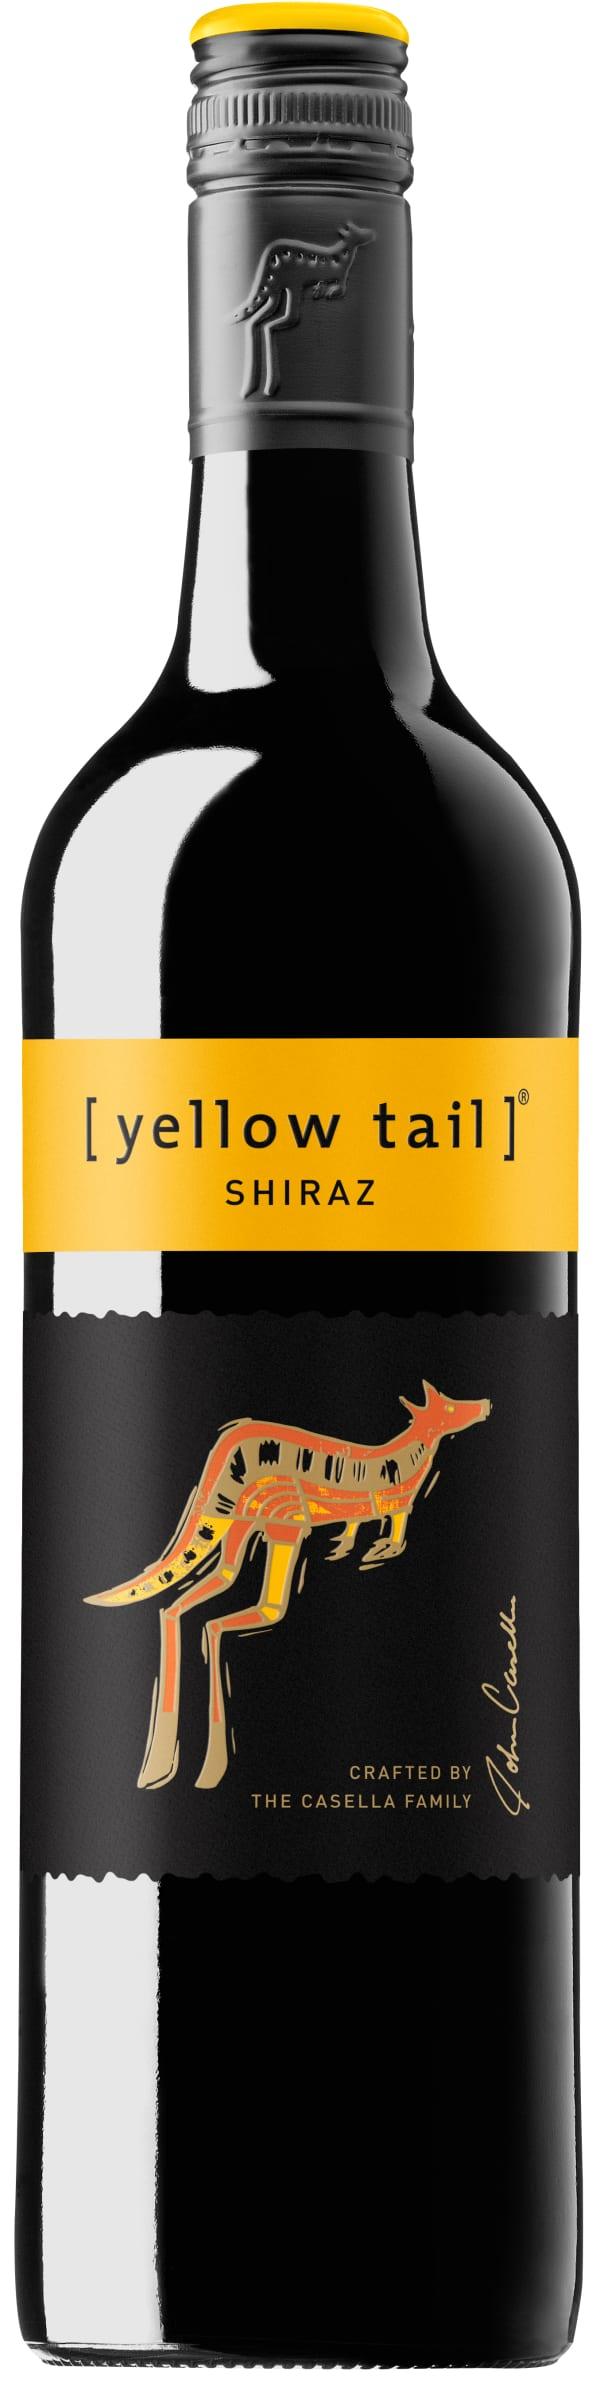 Yellow Tail Shiraz 2018